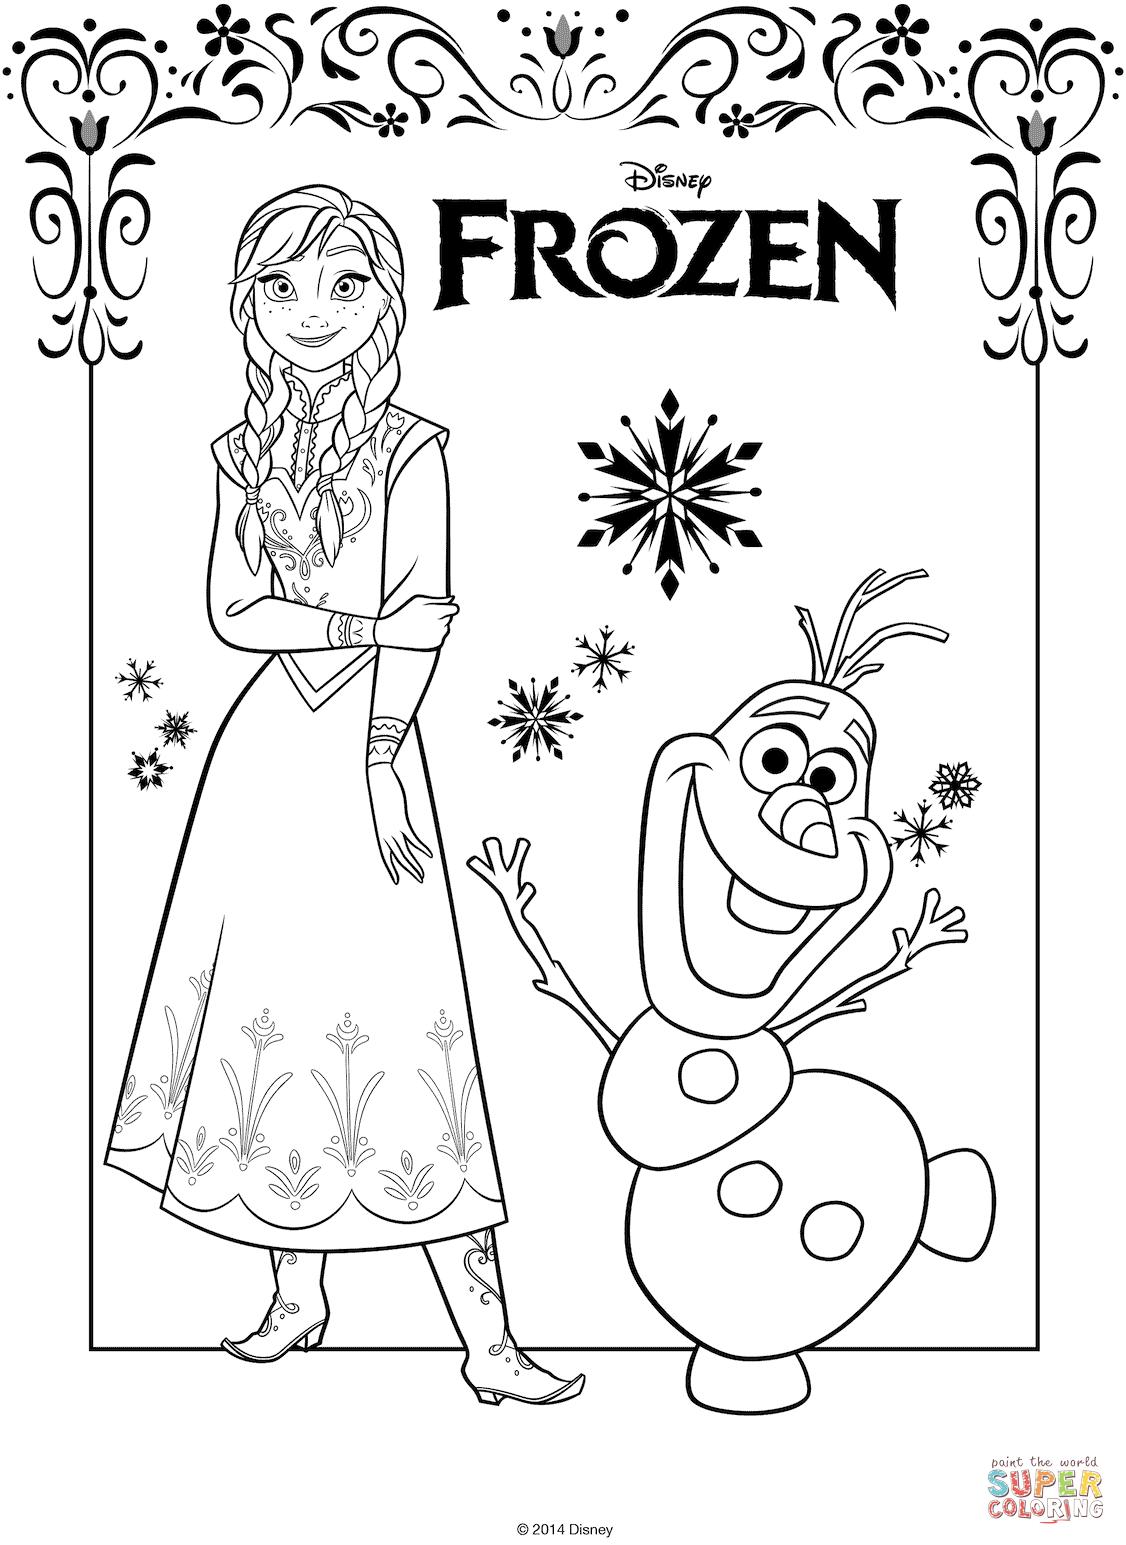 23+ Pretty Image of Printable Frozen Coloring Pages - birijus.com